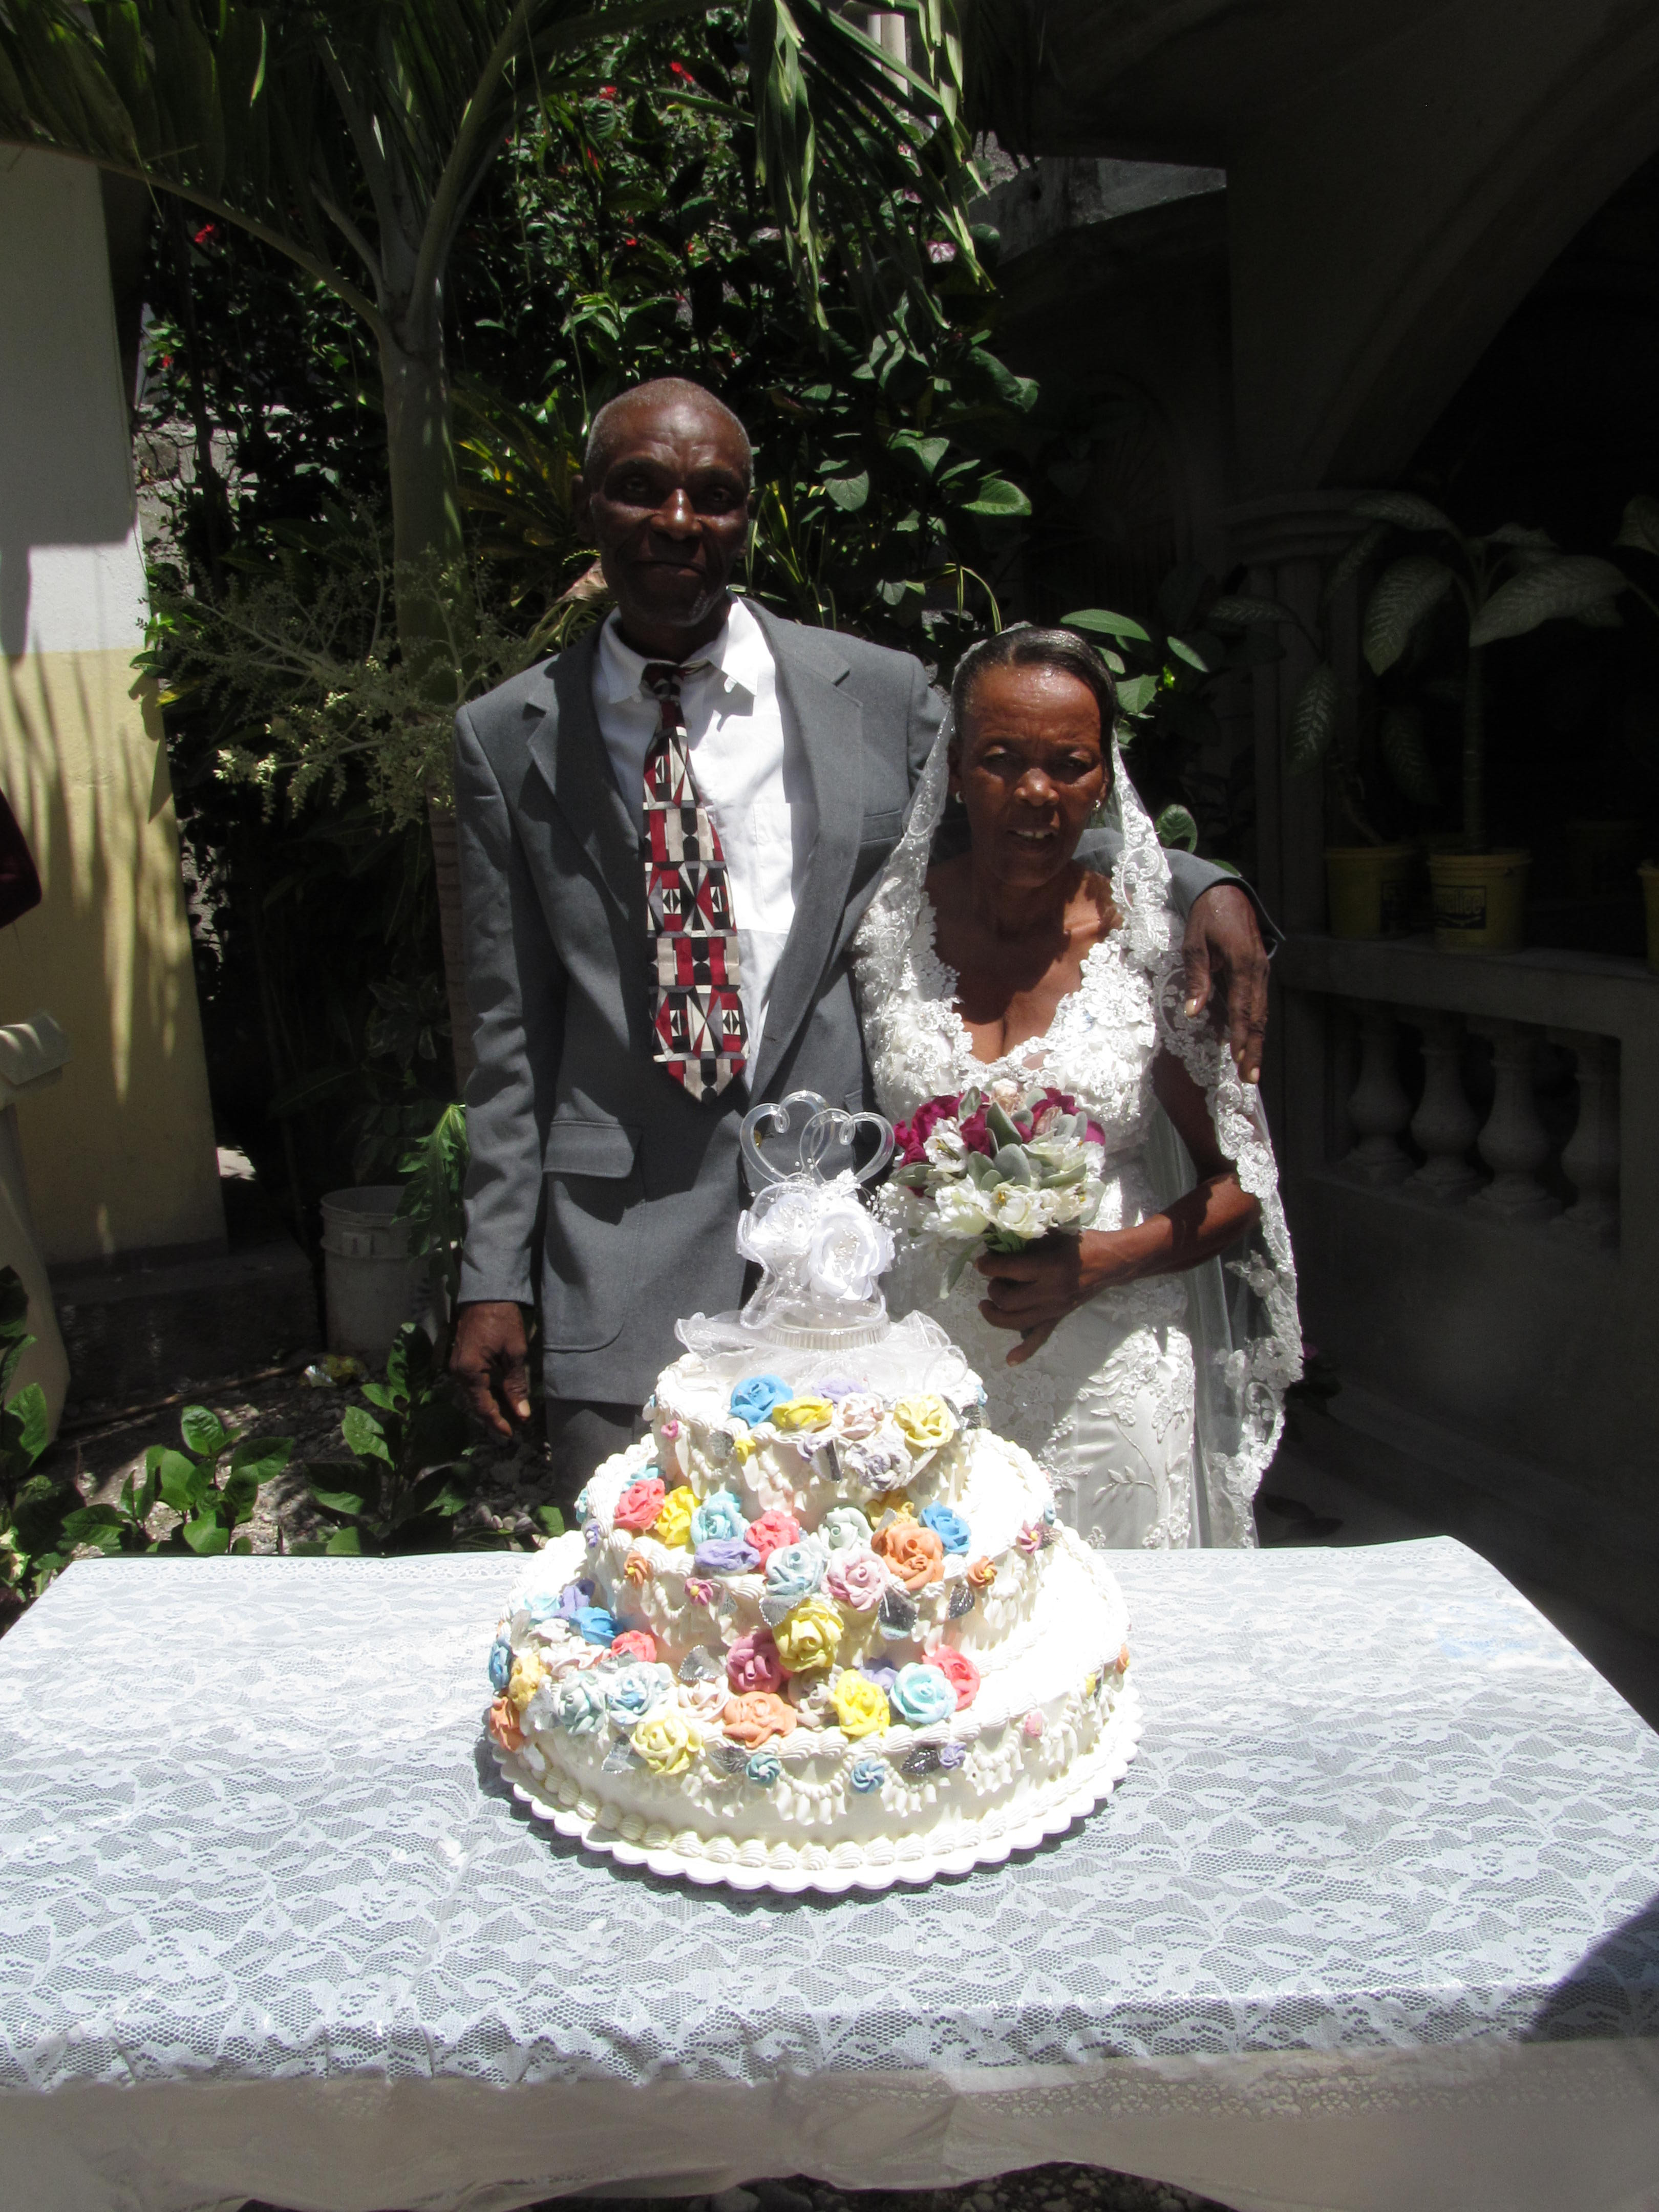 Haitian Wedding Cakes  Haitian Mass Wedding